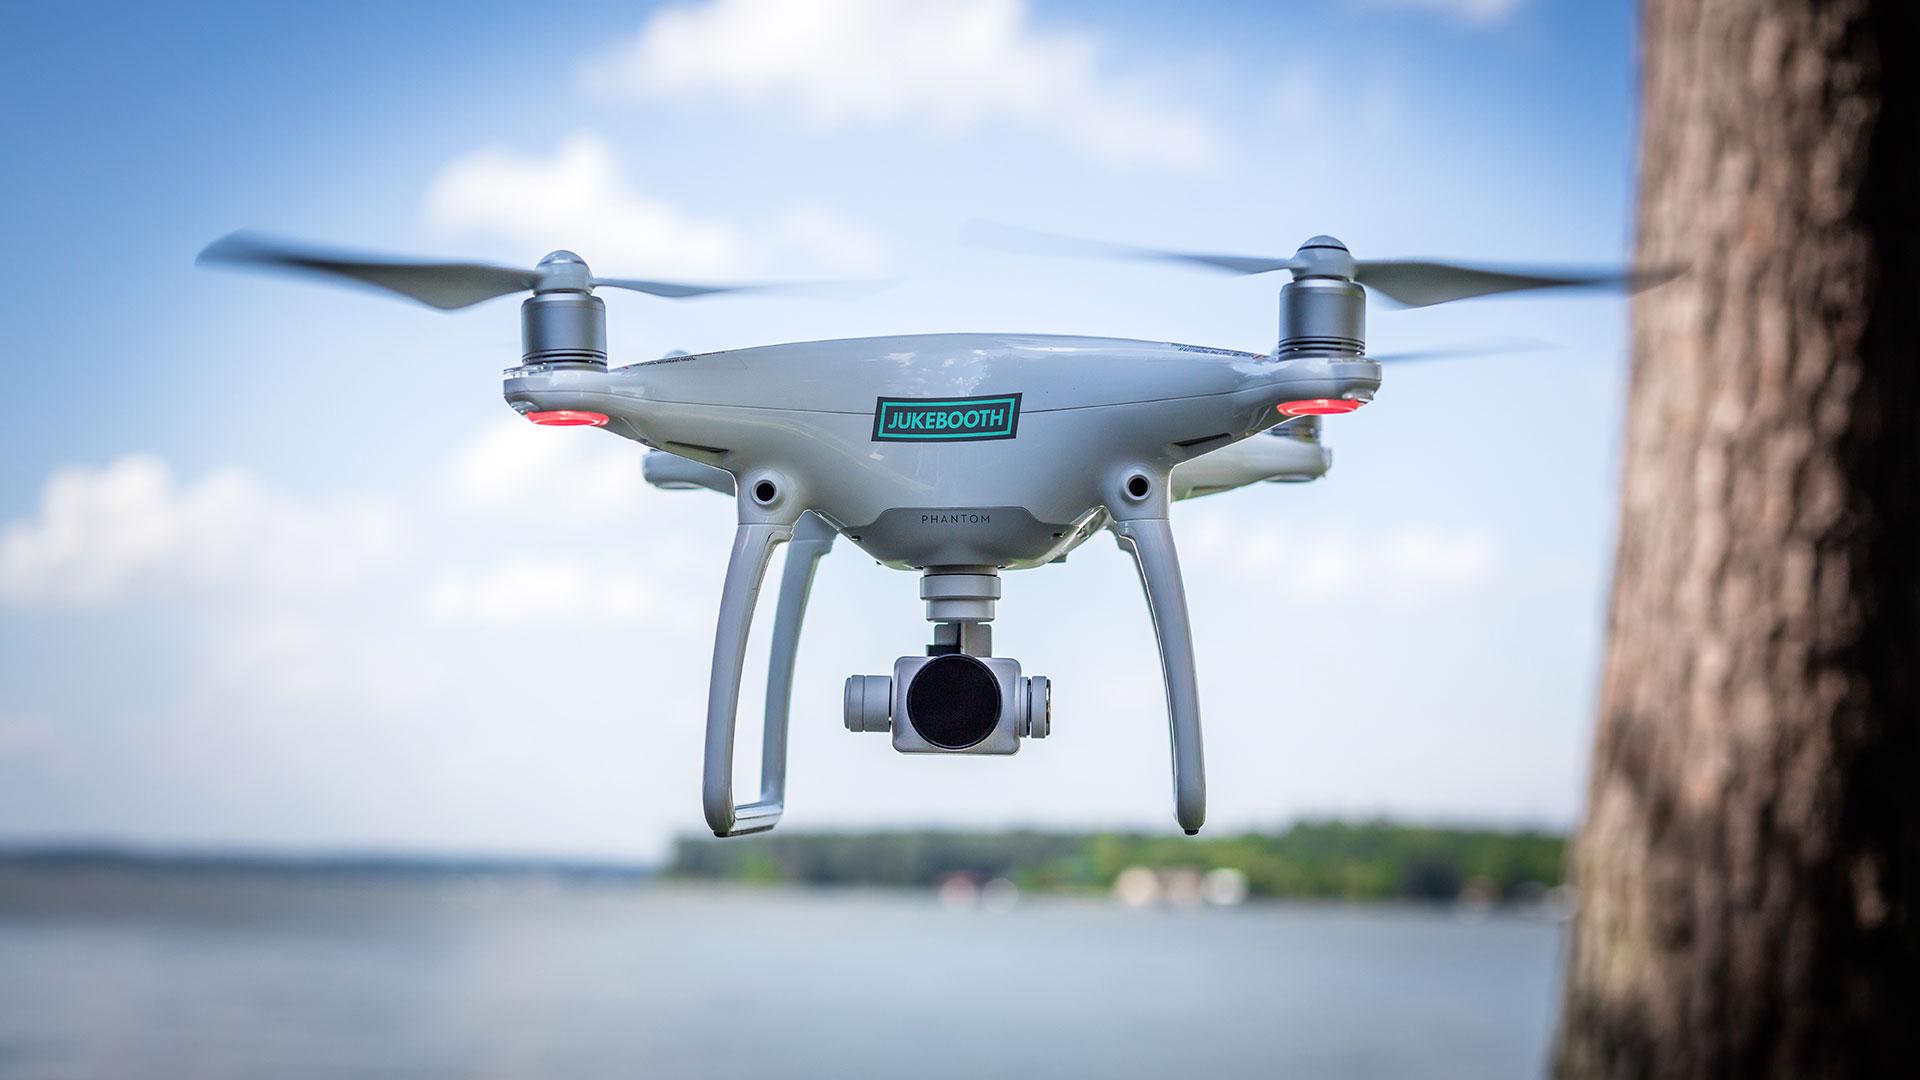 Jukebooth - Drone